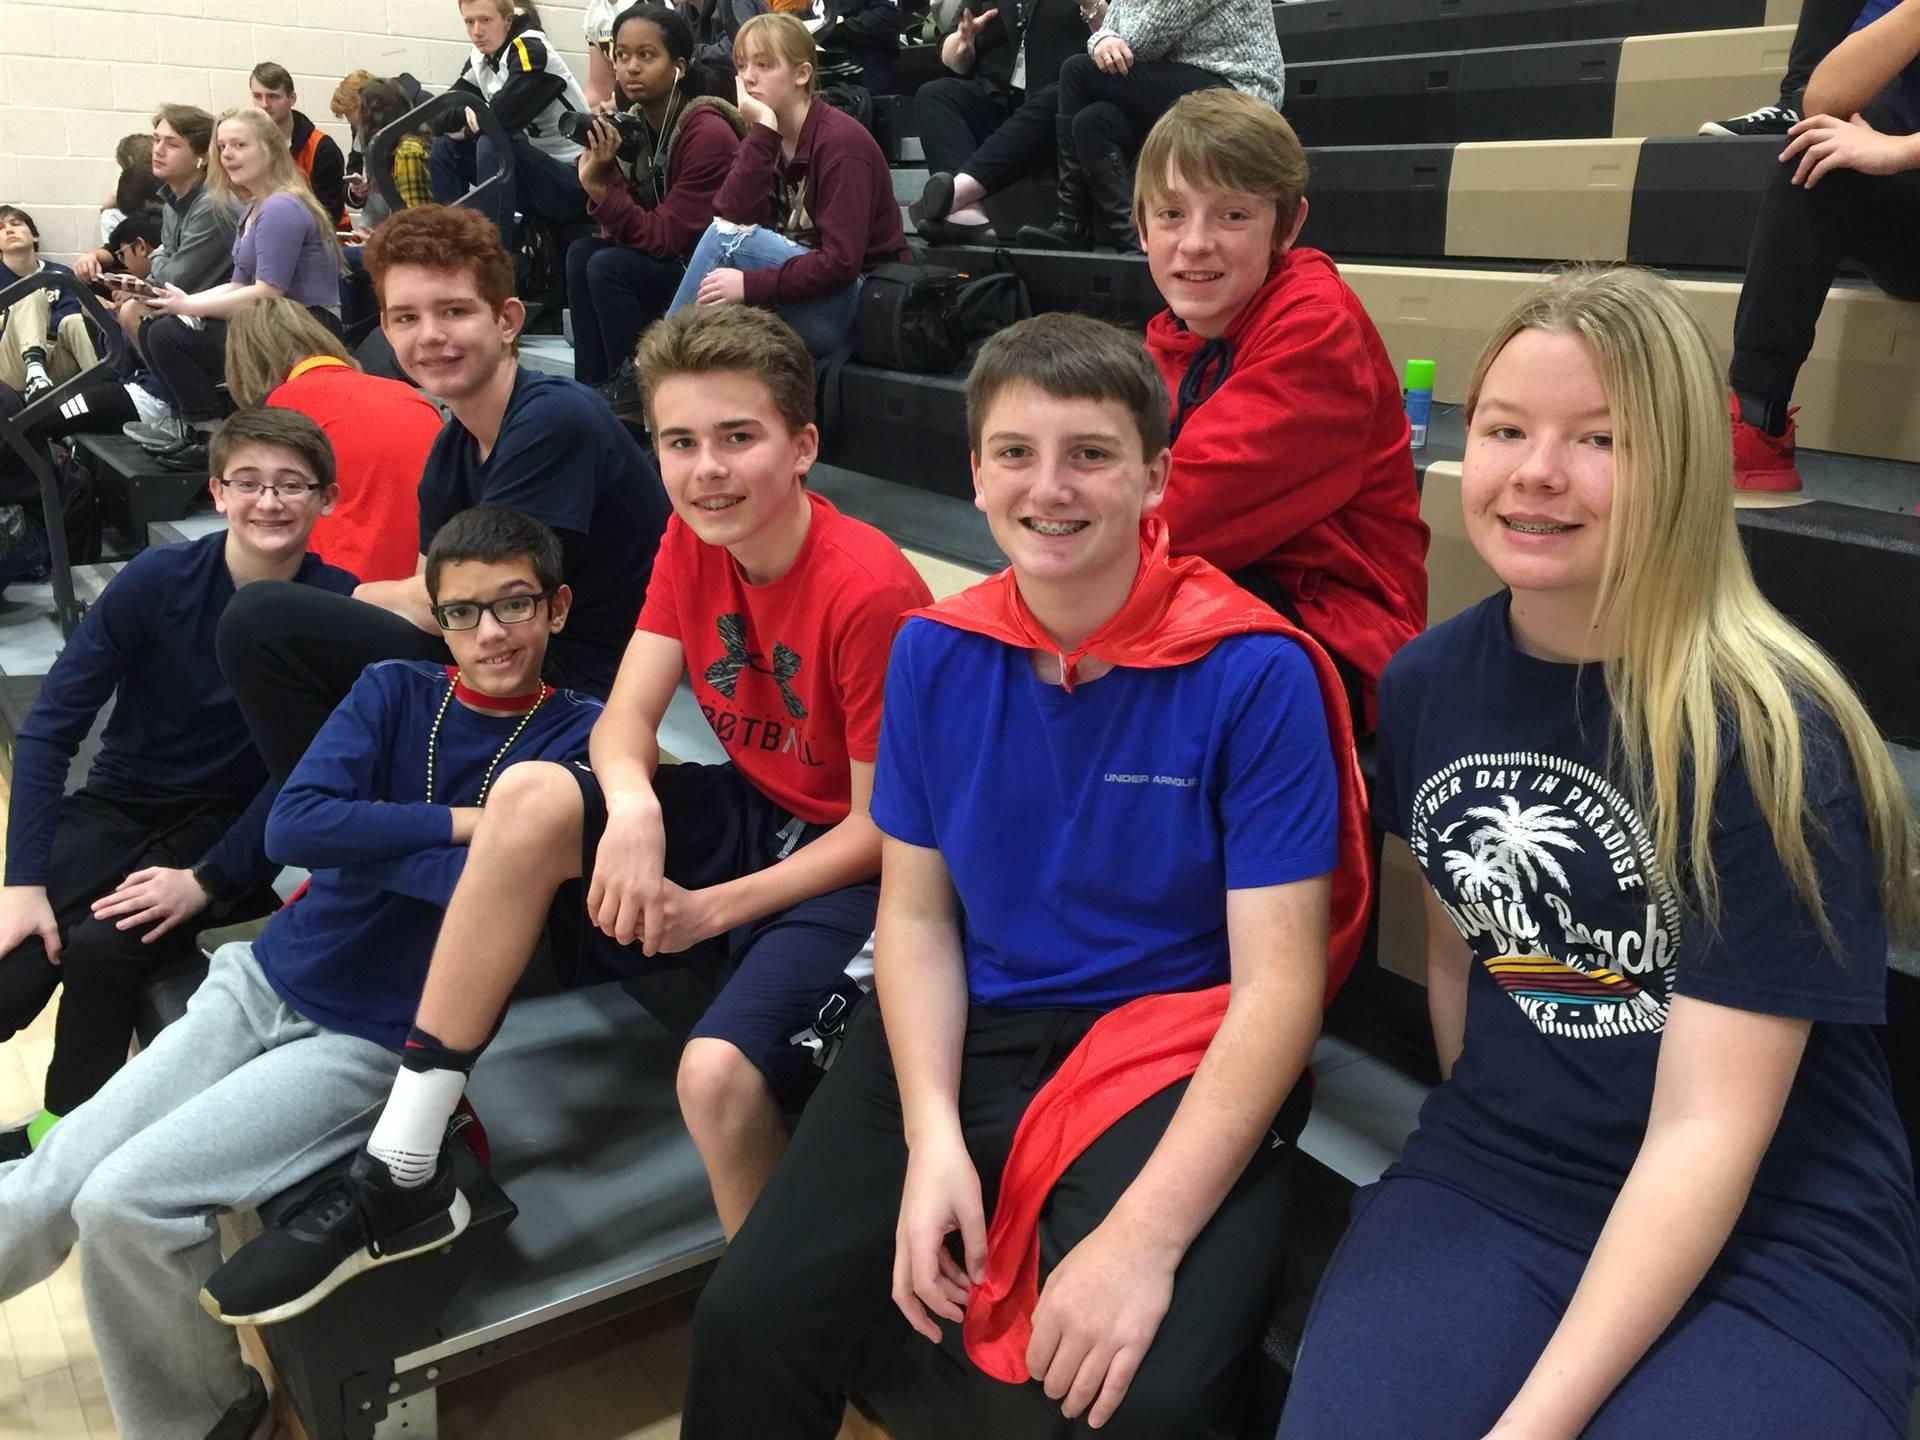 Jr. High School Students